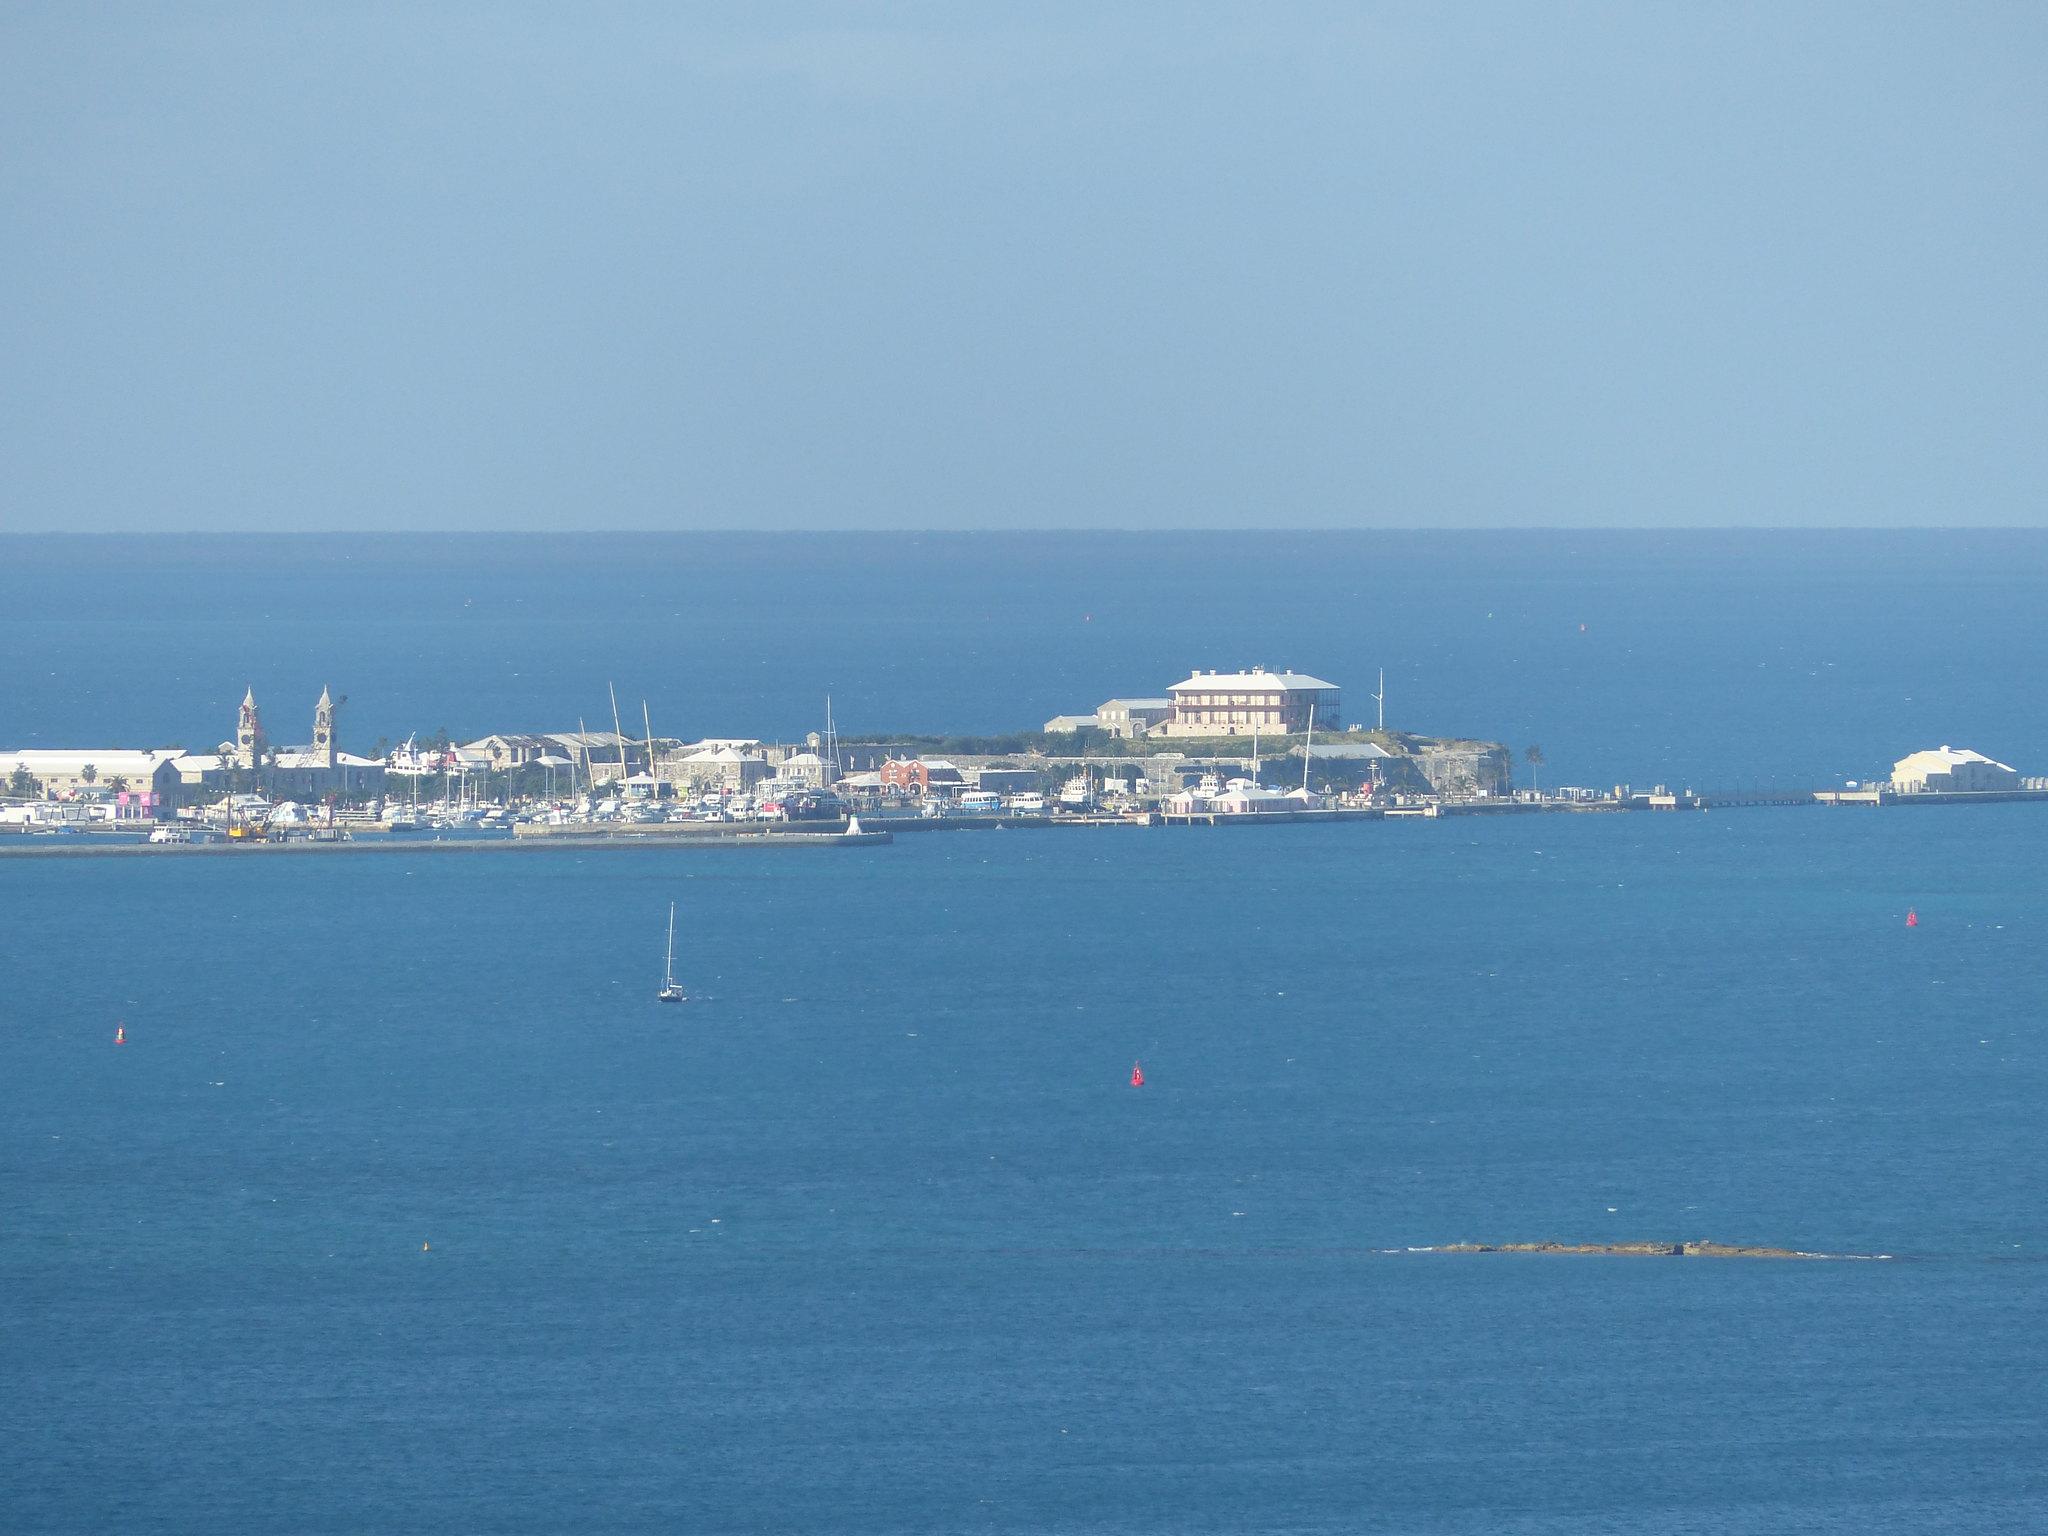 Royal Naval Dockyard from Gibbs Hill Lighthouse